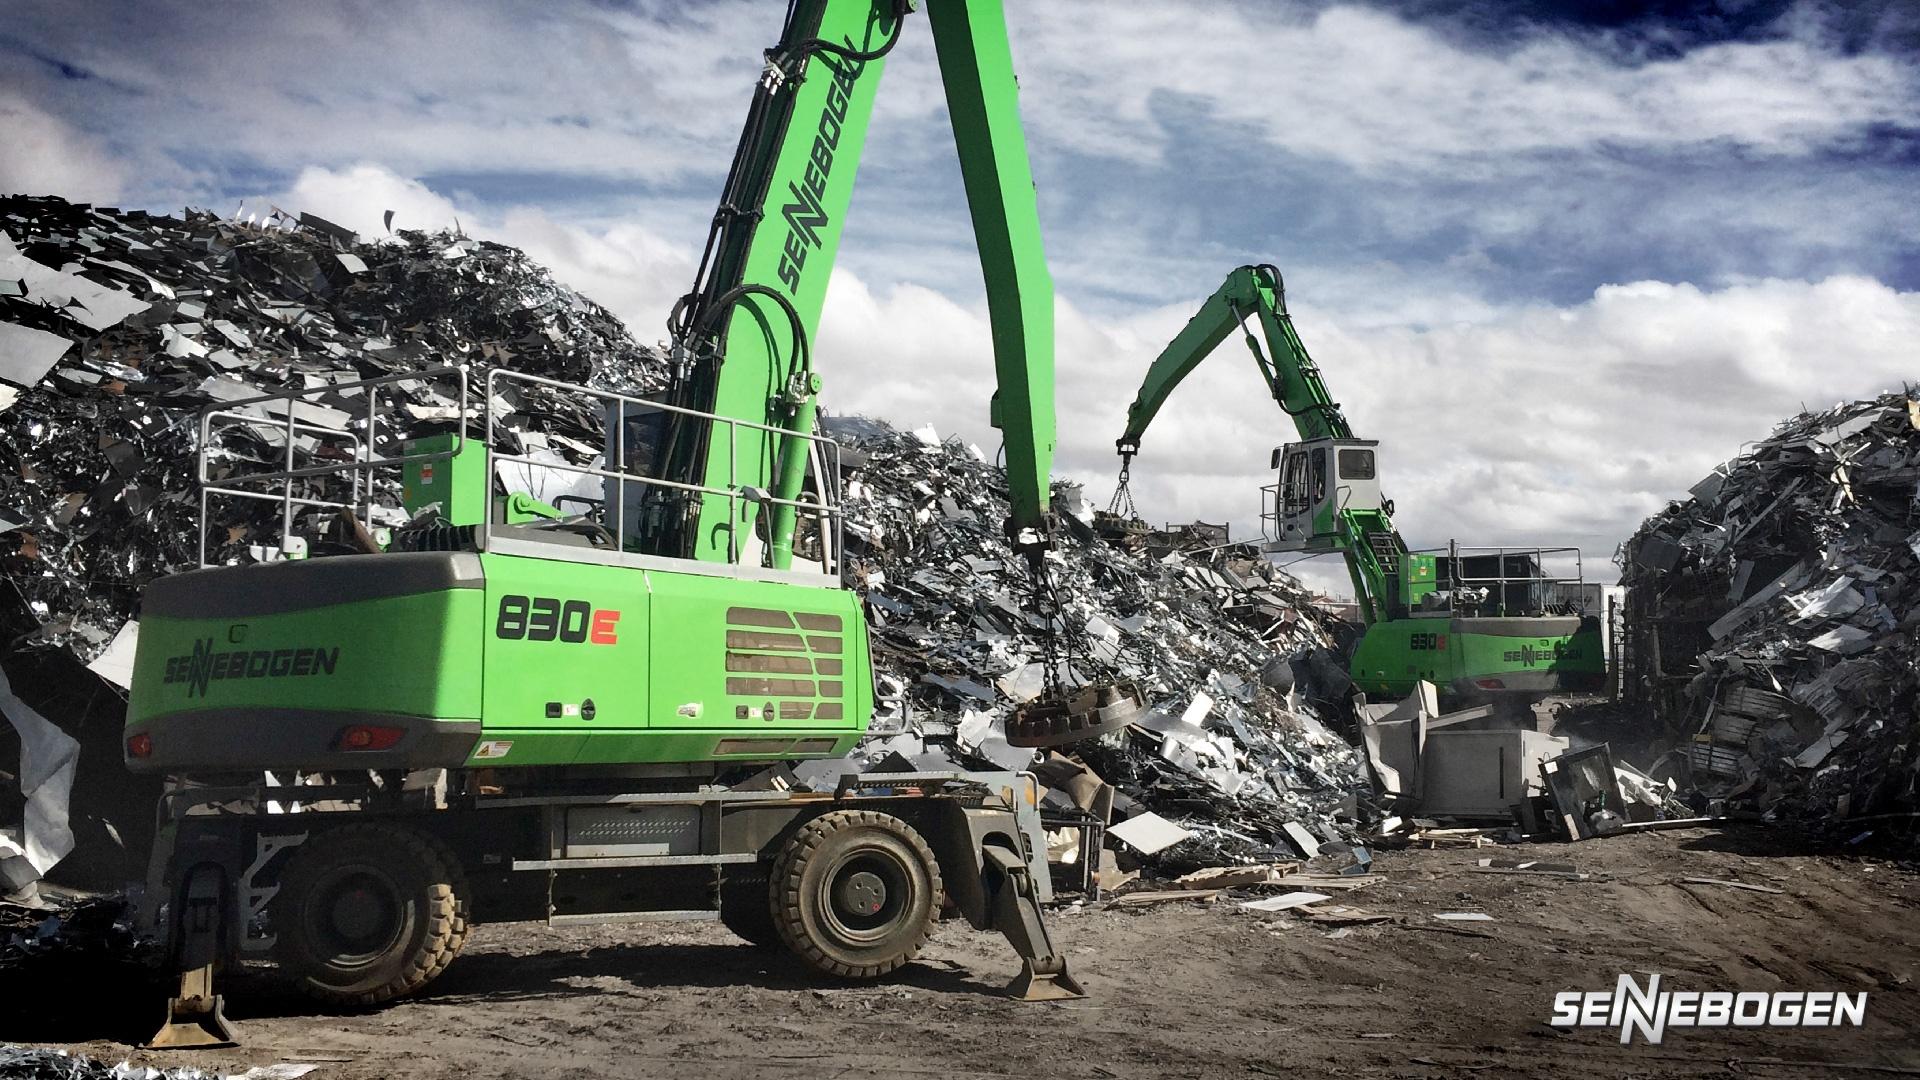 sennebogen material handling machine moving scrap metal